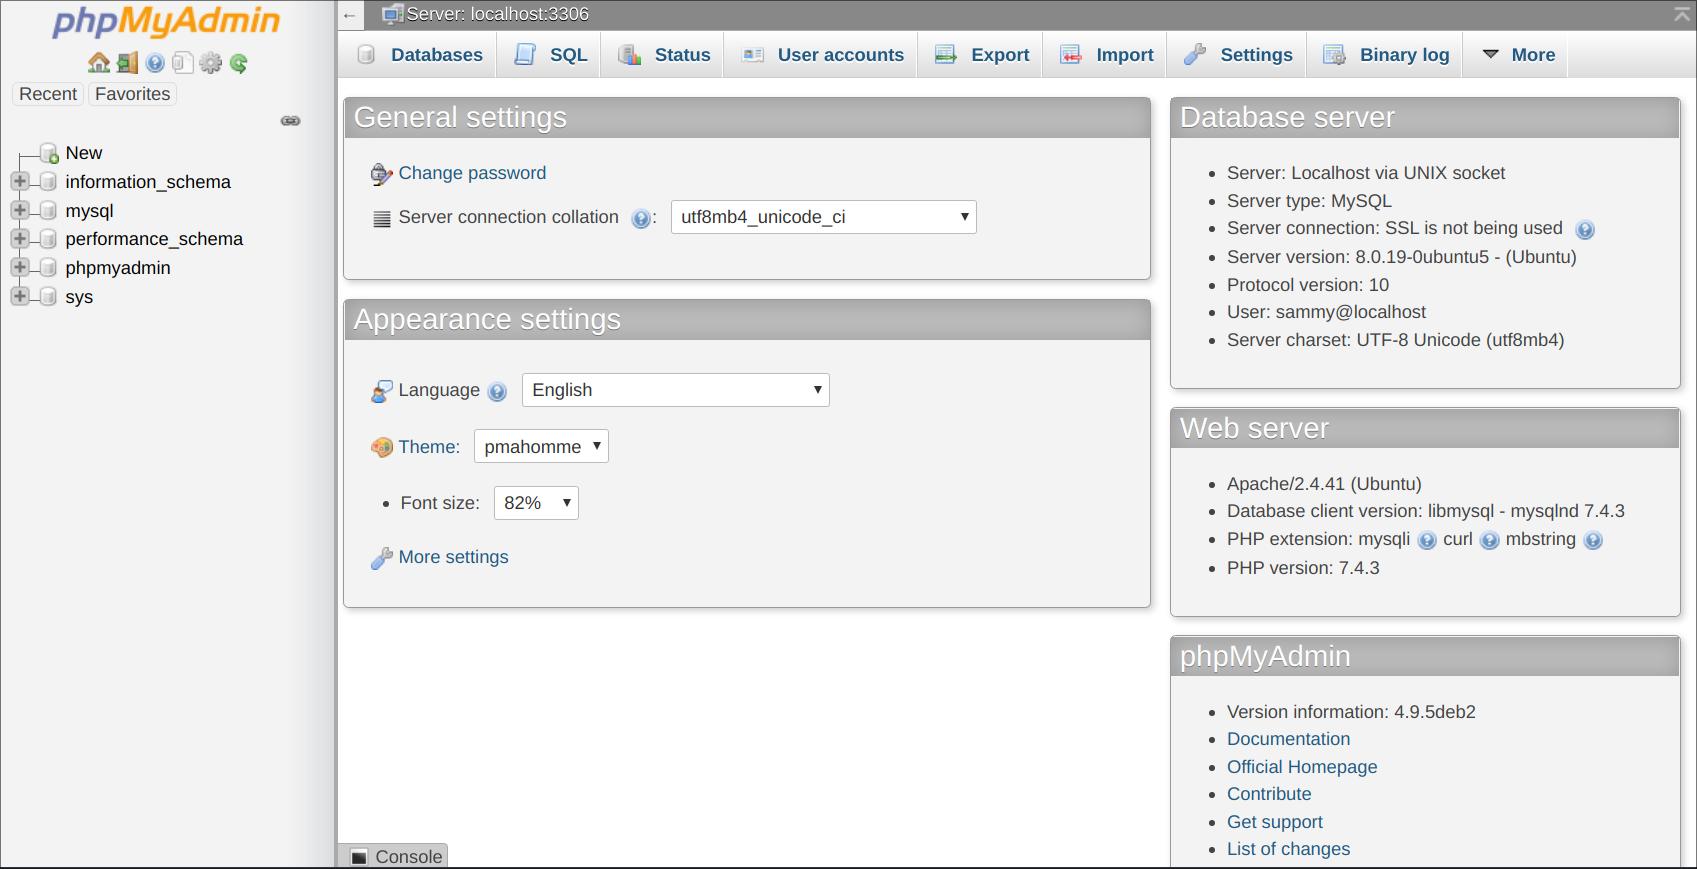 phpMyAdmin user interface